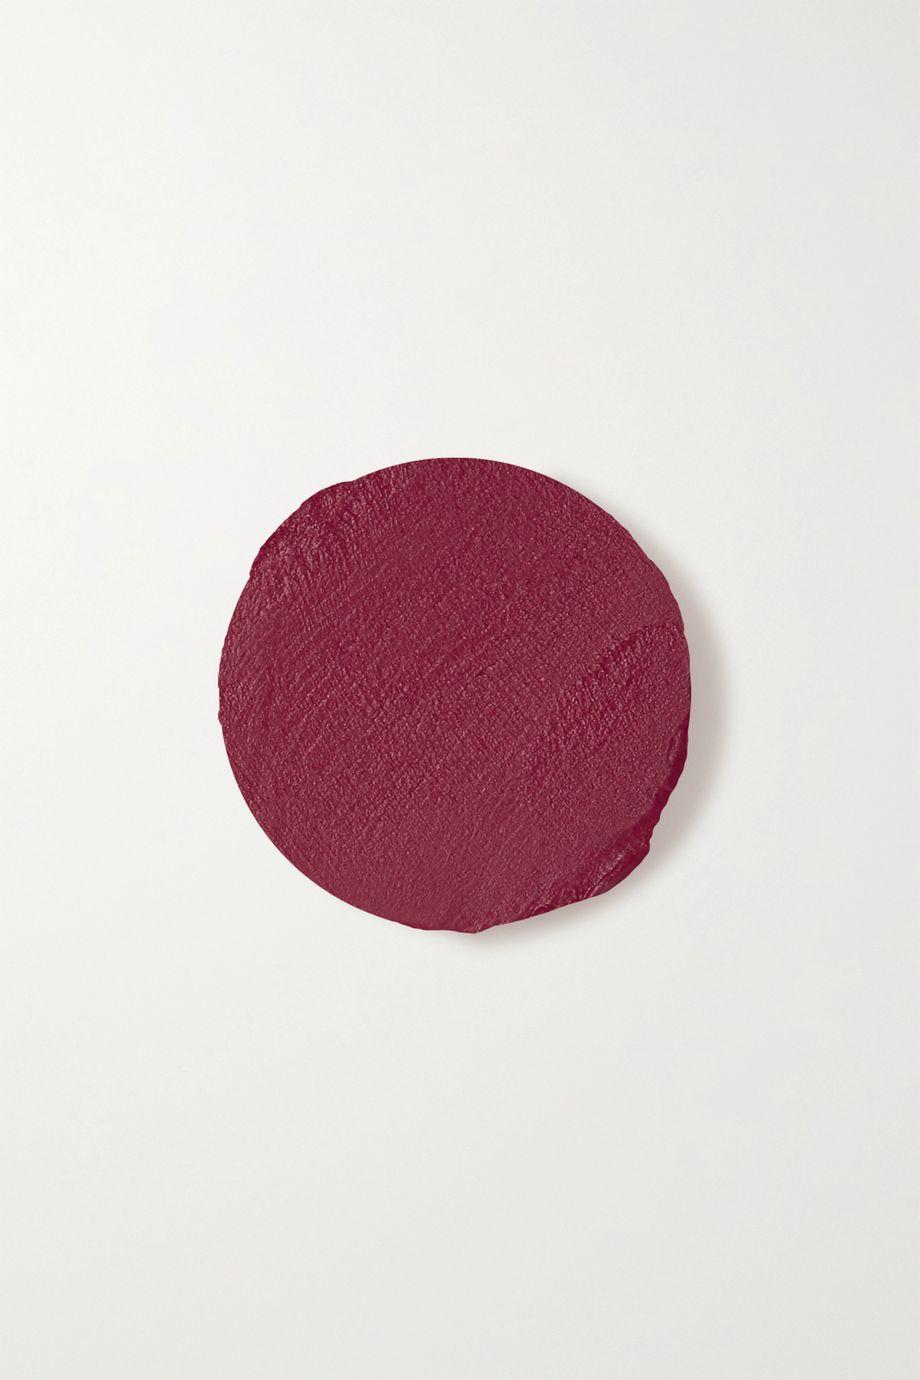 Serge Lutens Lipstick Refill - Roman Rouge 2